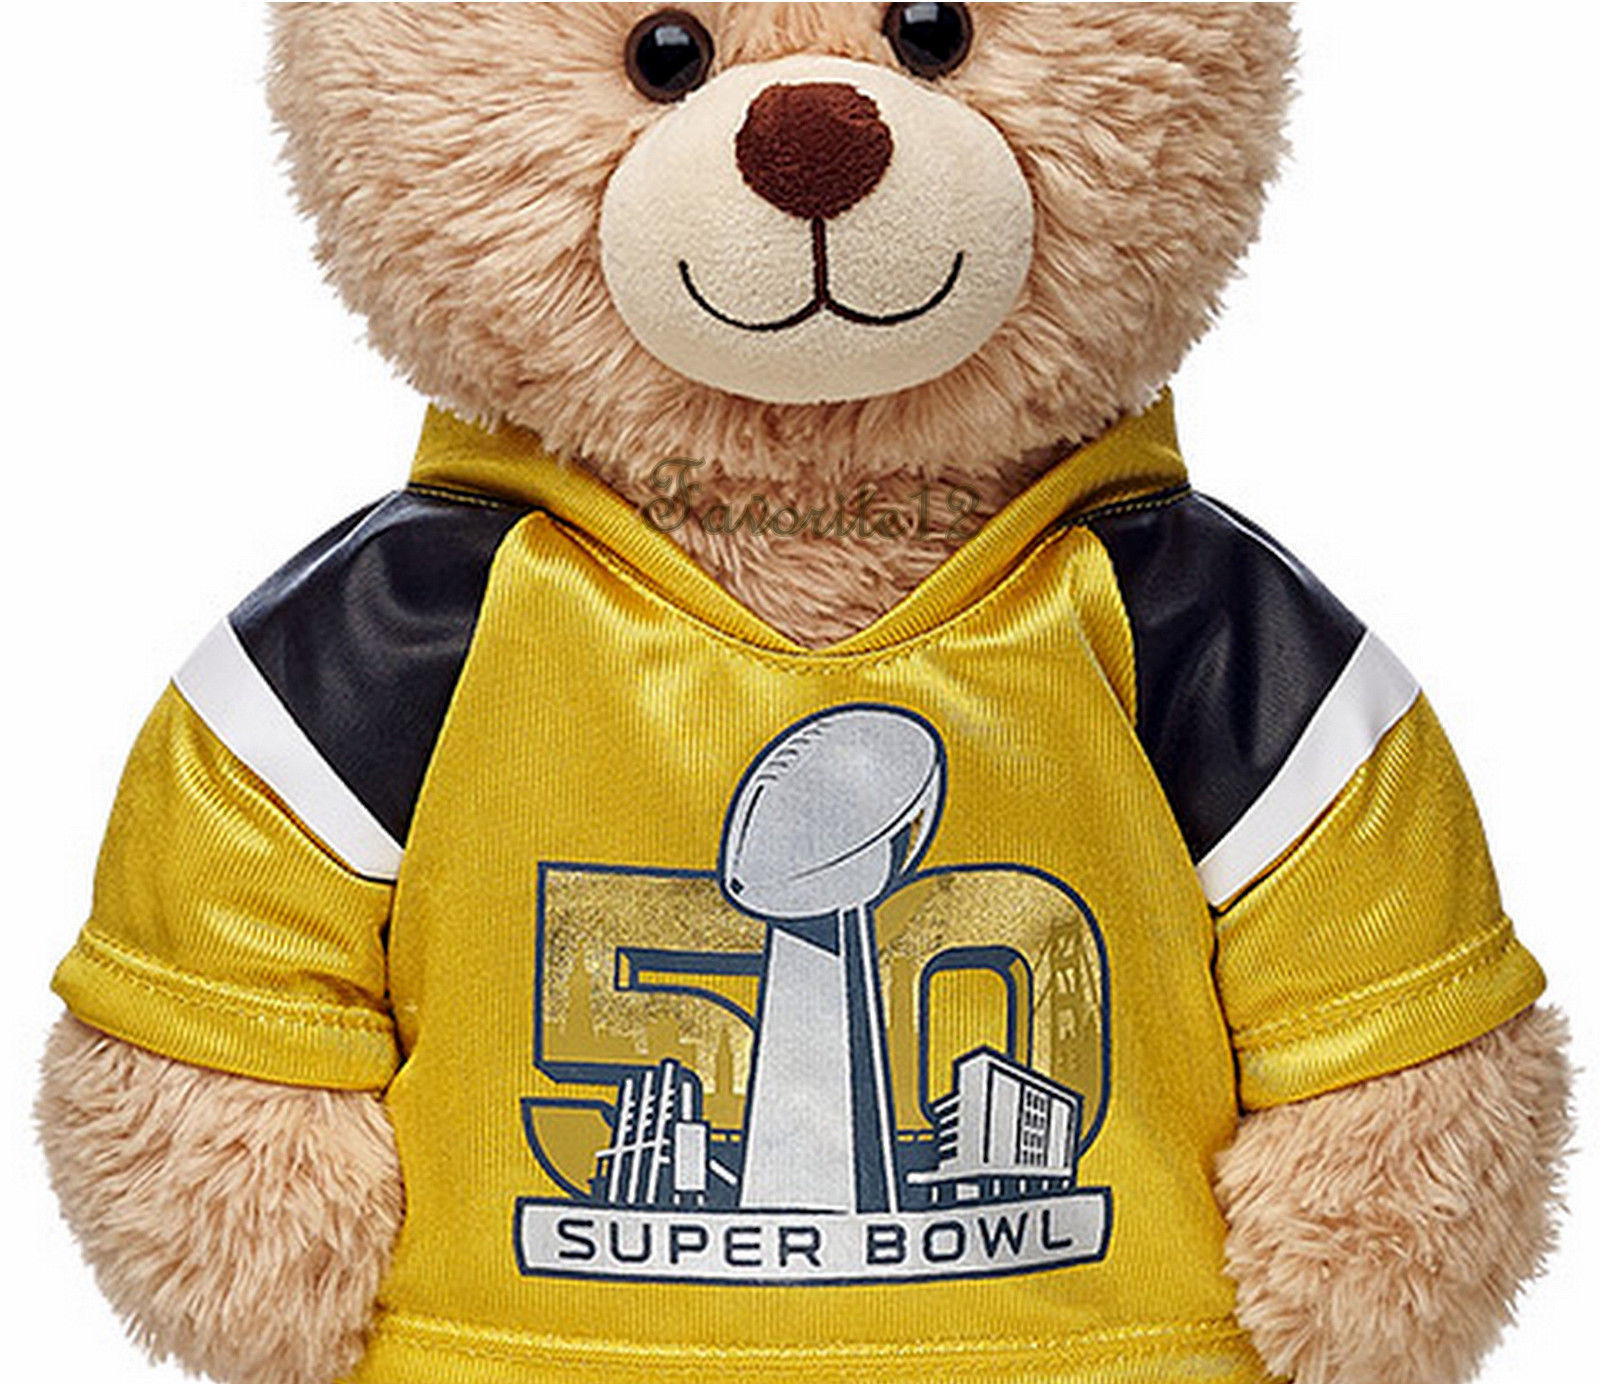 build a bear super bowl 50 golden football jersey nfl teddy size gold t shirt build a bear. Black Bedroom Furniture Sets. Home Design Ideas